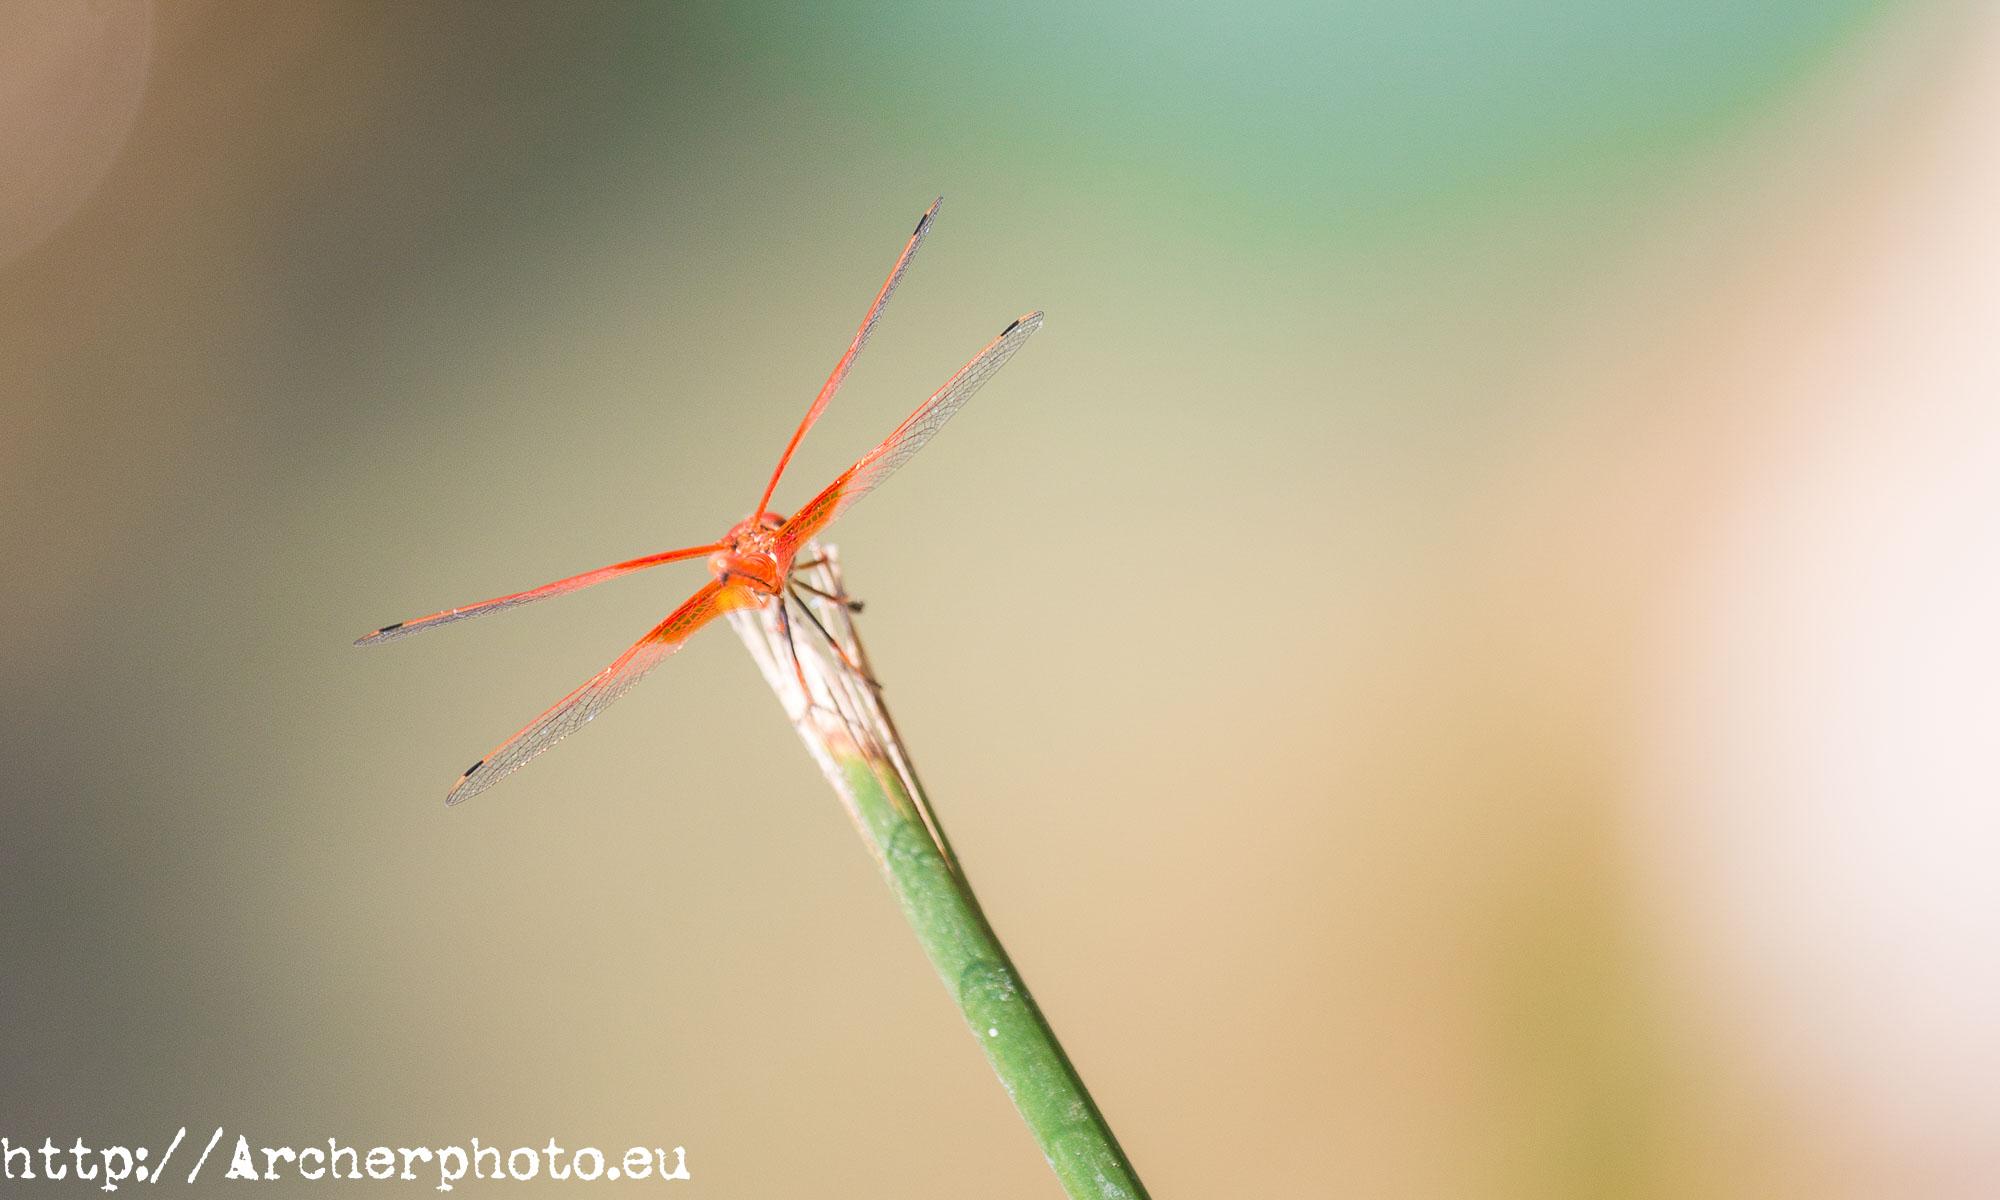 Libélula naranja, Libellula saturata por Archerphoto, fotógrafo profesional